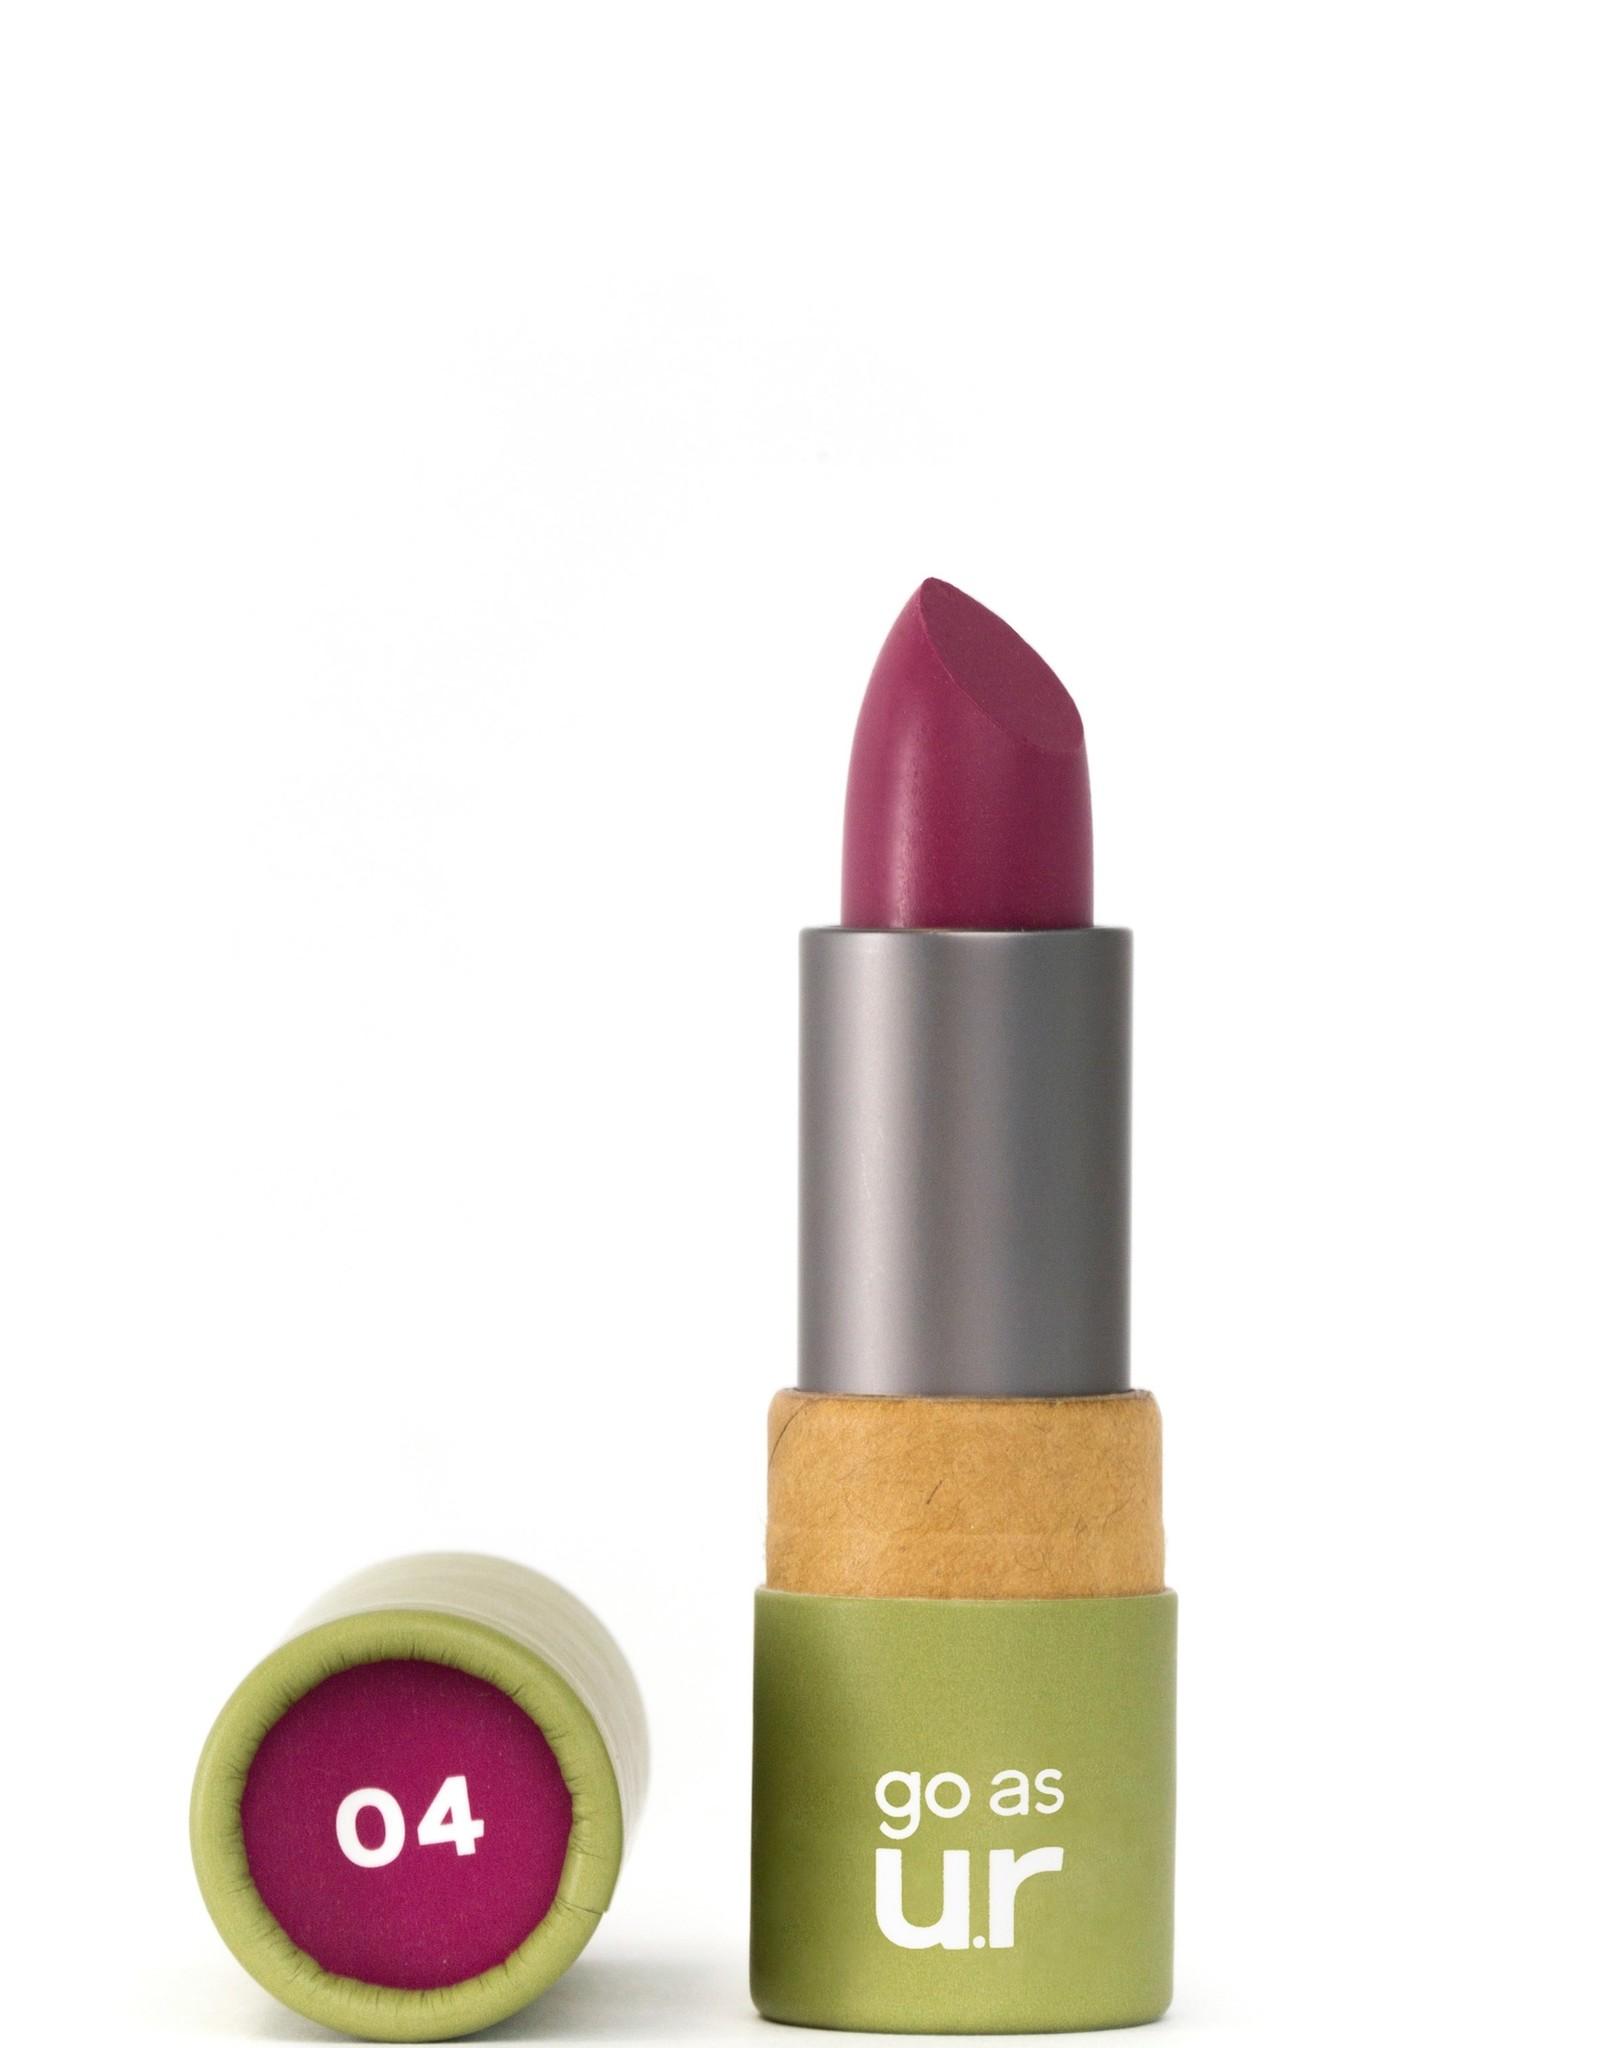 Go as ur Vegan Lippenstift Deep Fuchsia